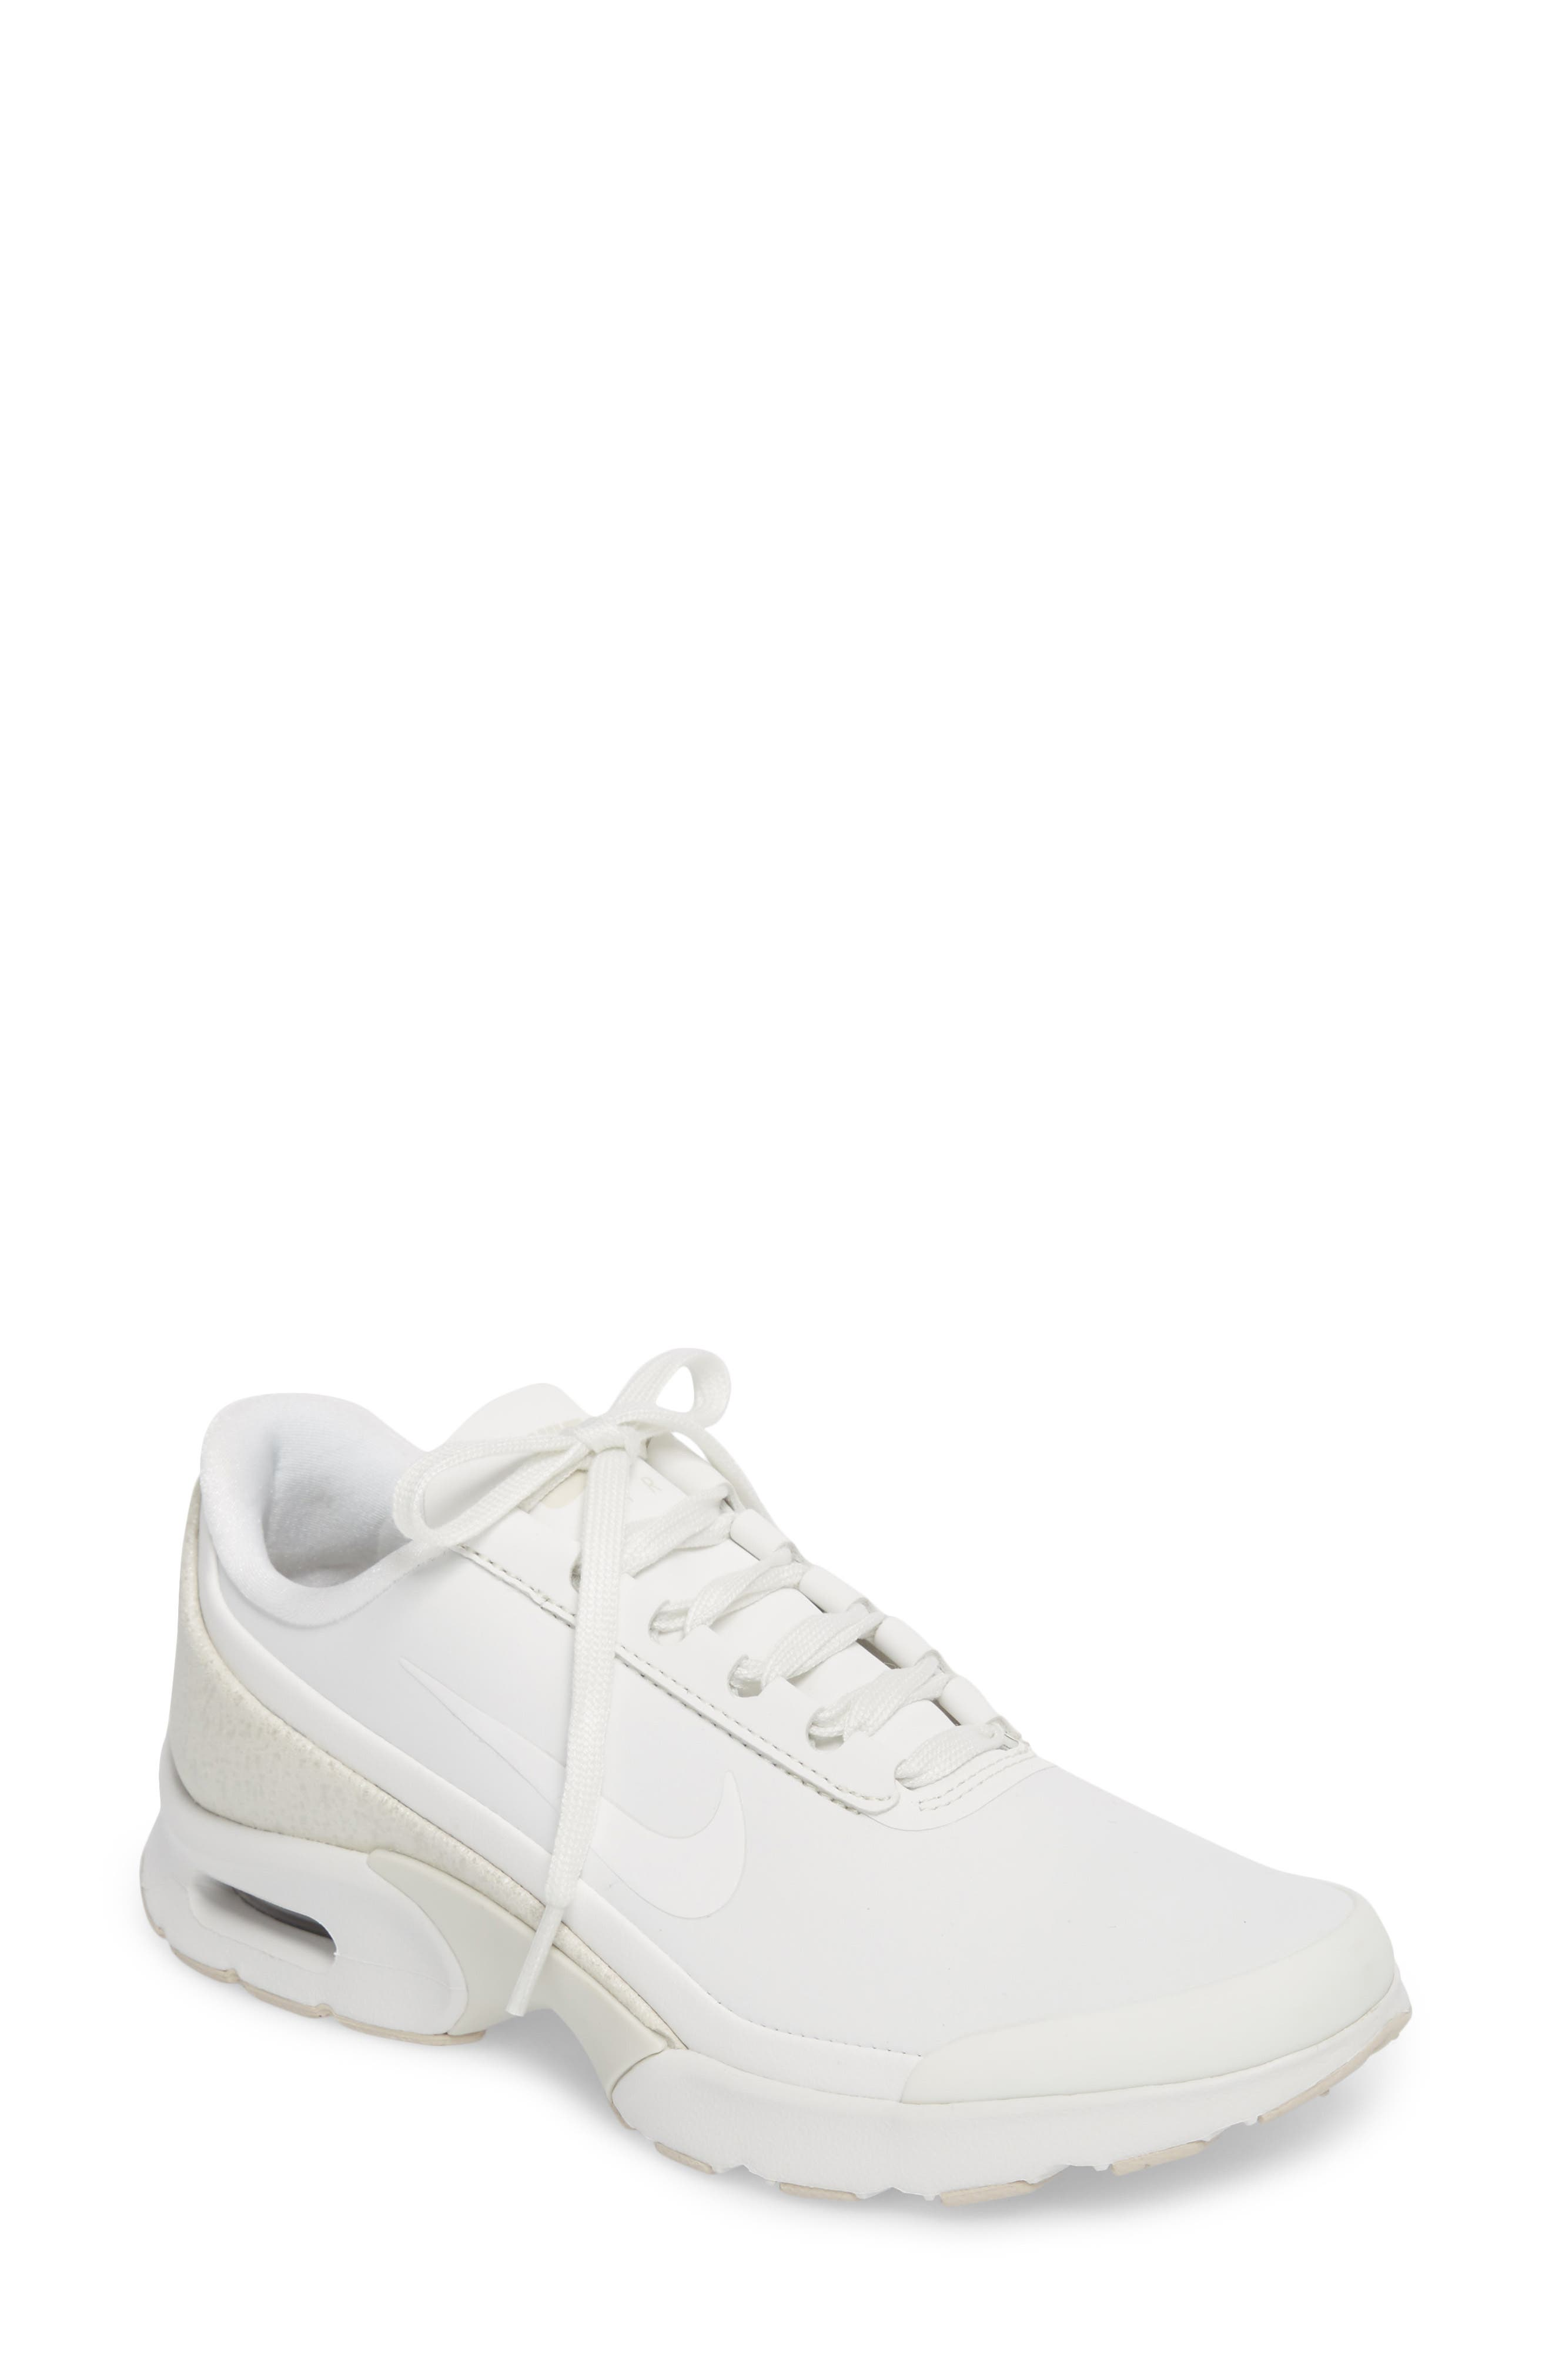 Air Max Jewell Sneaker,                         Main,                         color, 100